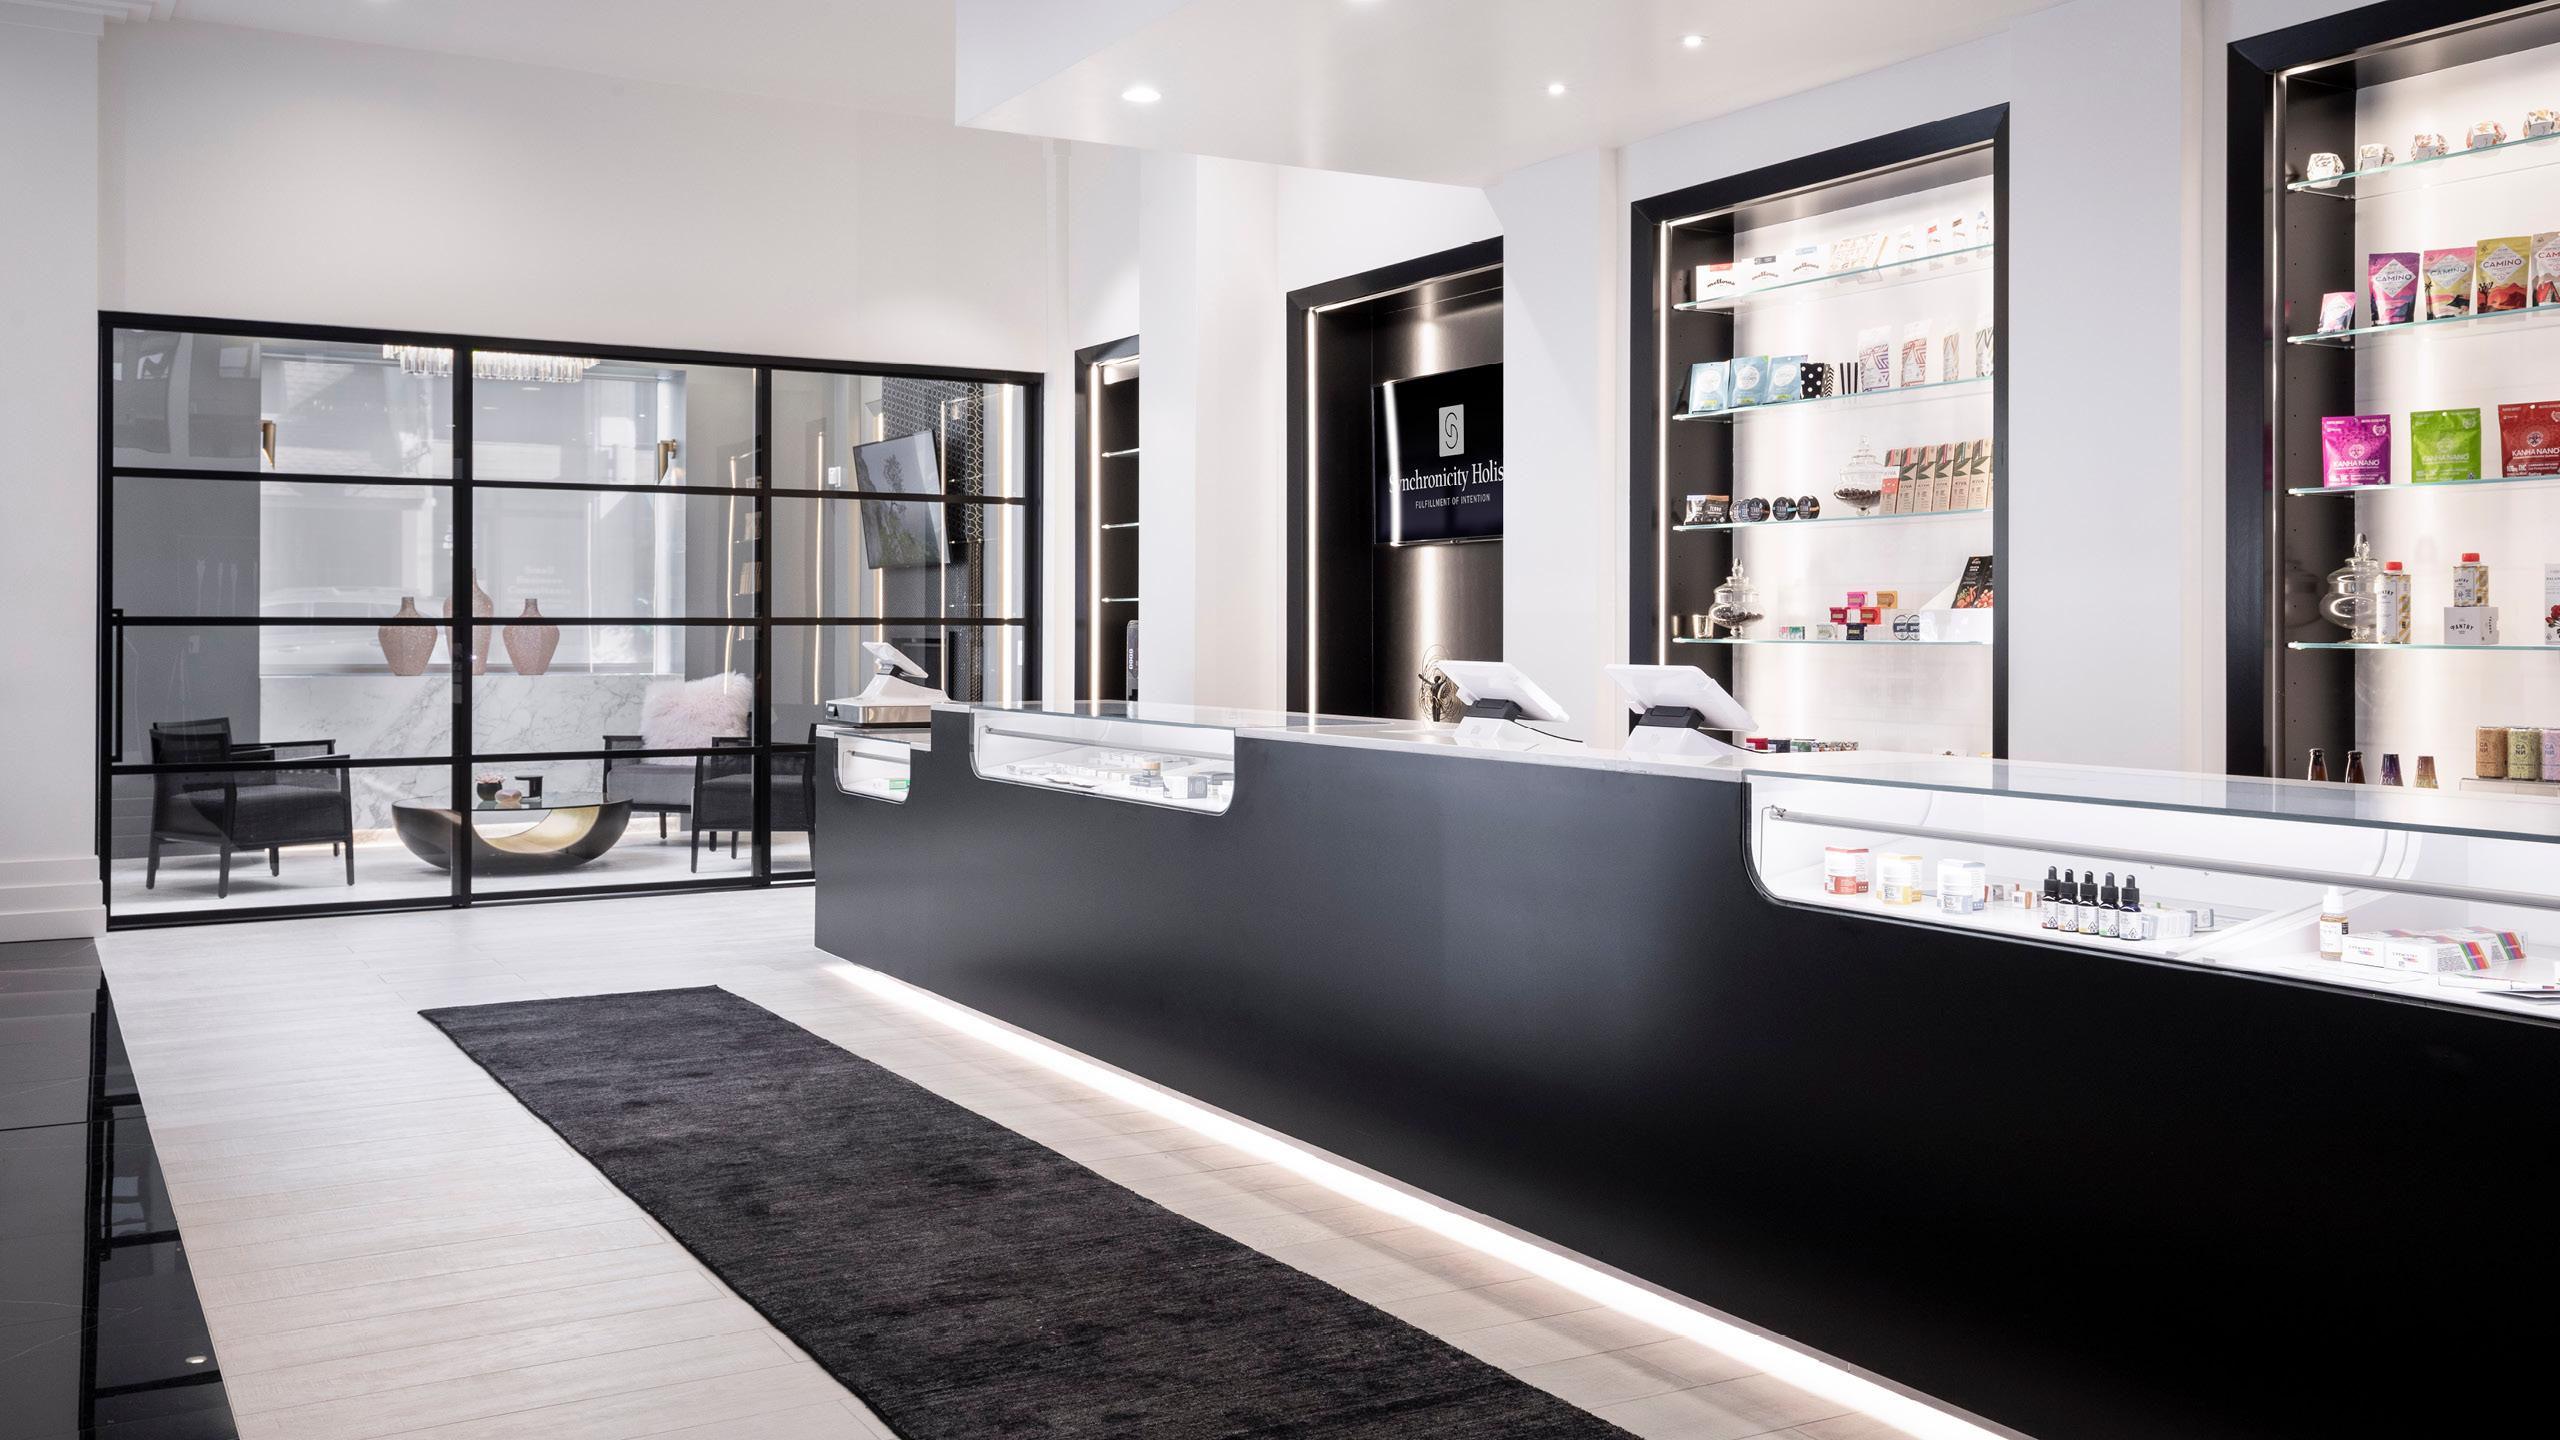 Synchronicity Holistic Dispensary Interior Design by High Road Design Studio